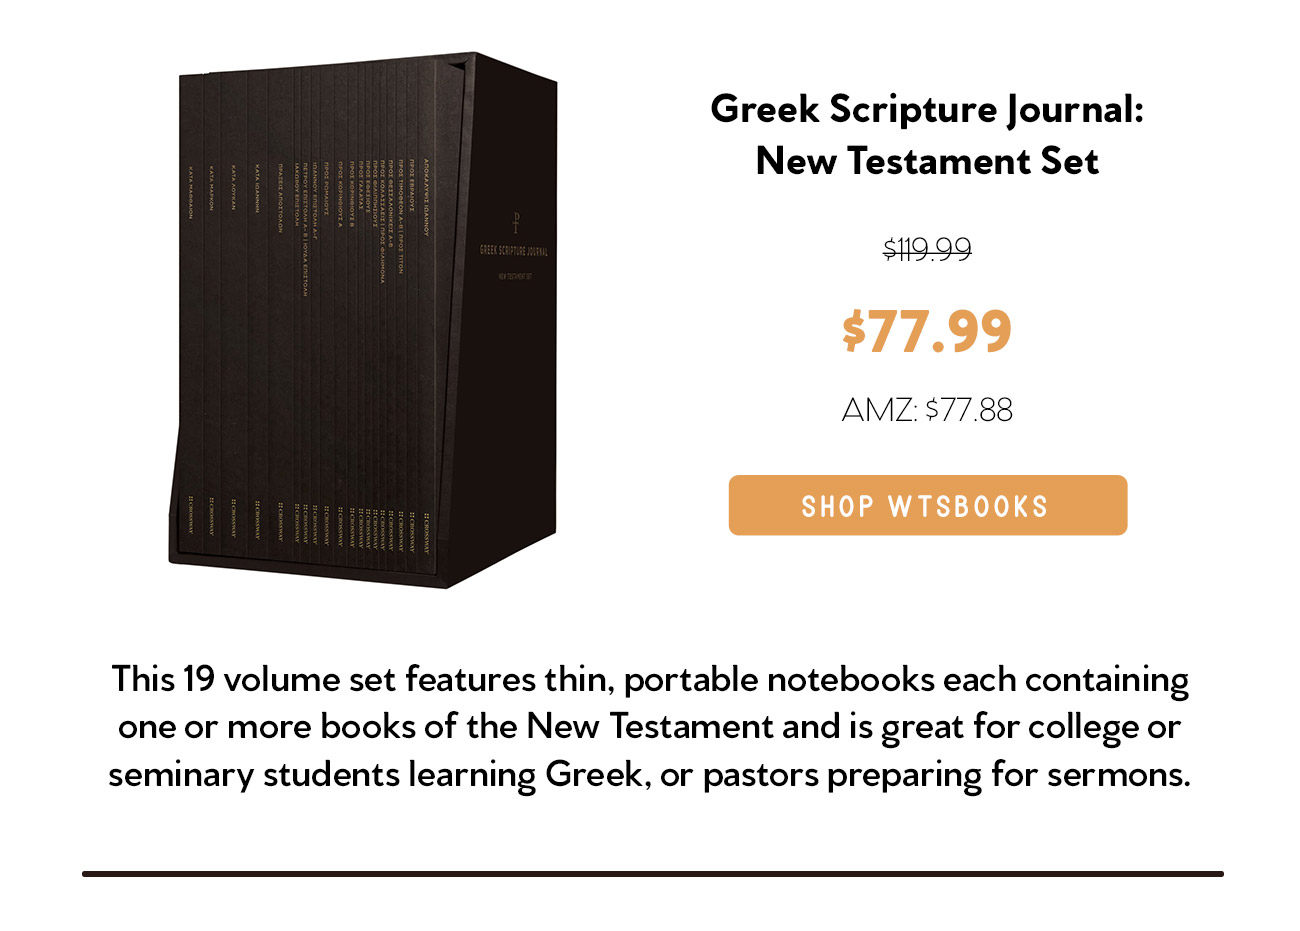 Greek Scripture Journal NT Set